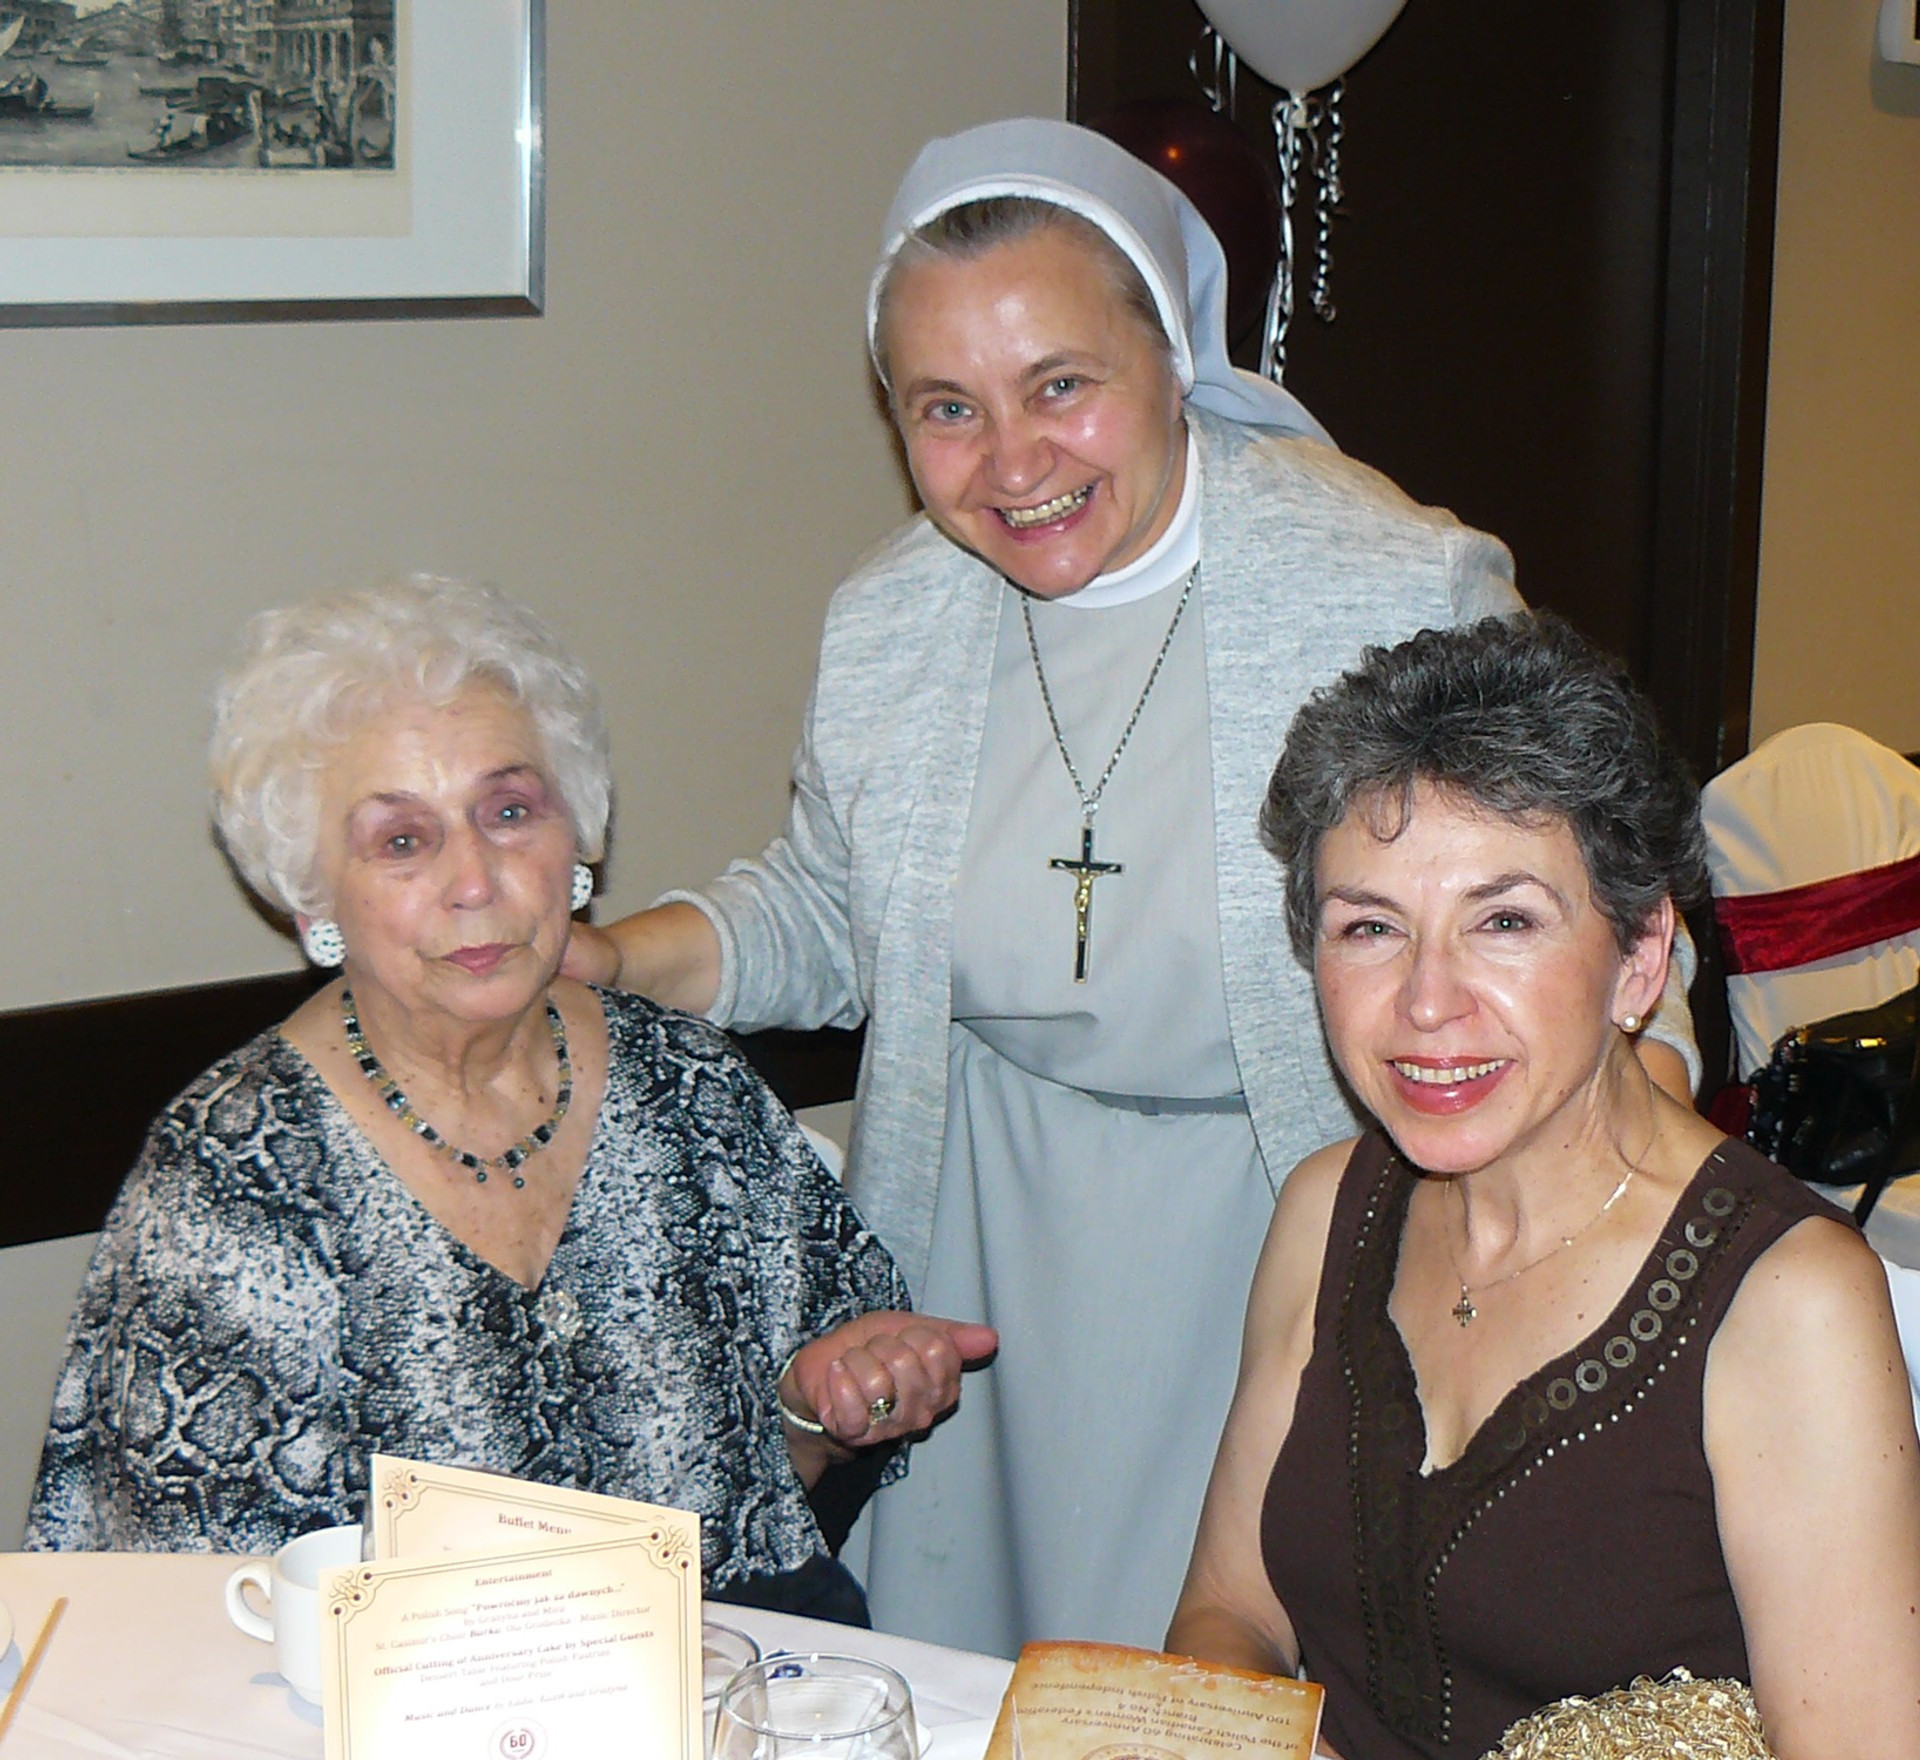 S. Stawecka and her daugher , sister Renata,